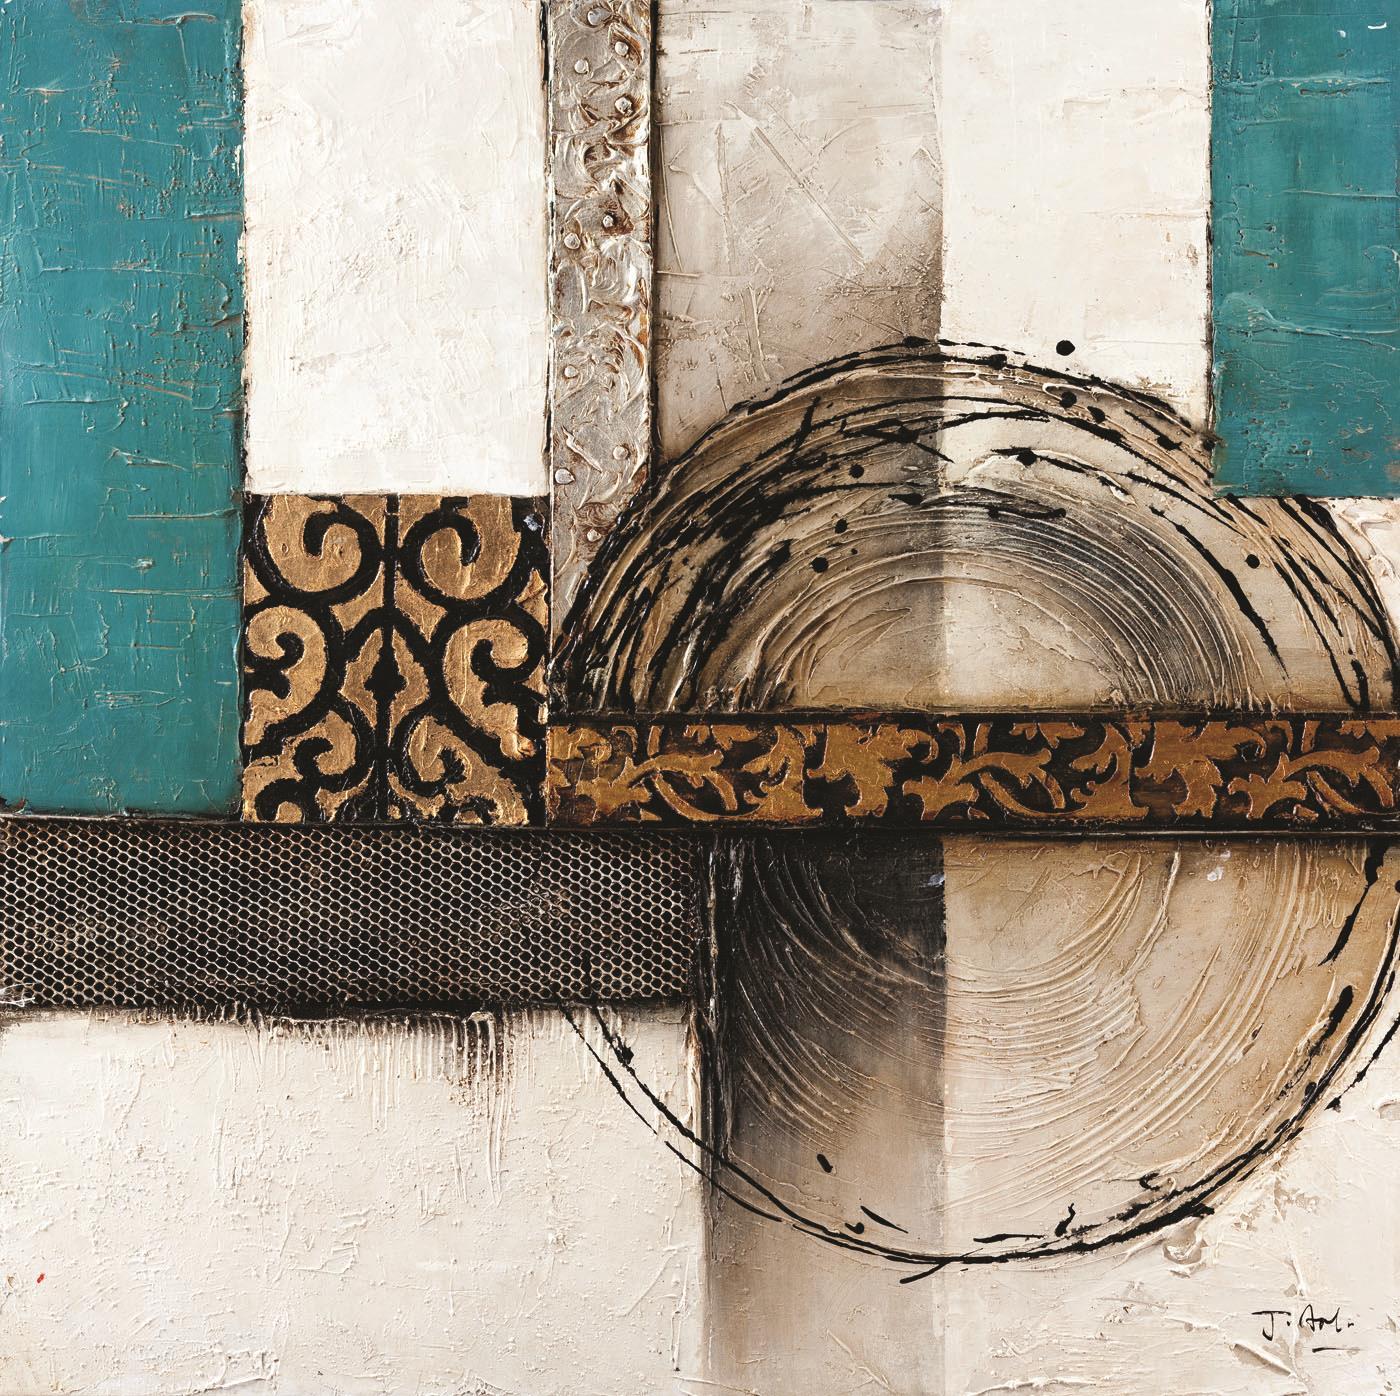 Coaster Wall Art Wall Art - Item Number: 960552